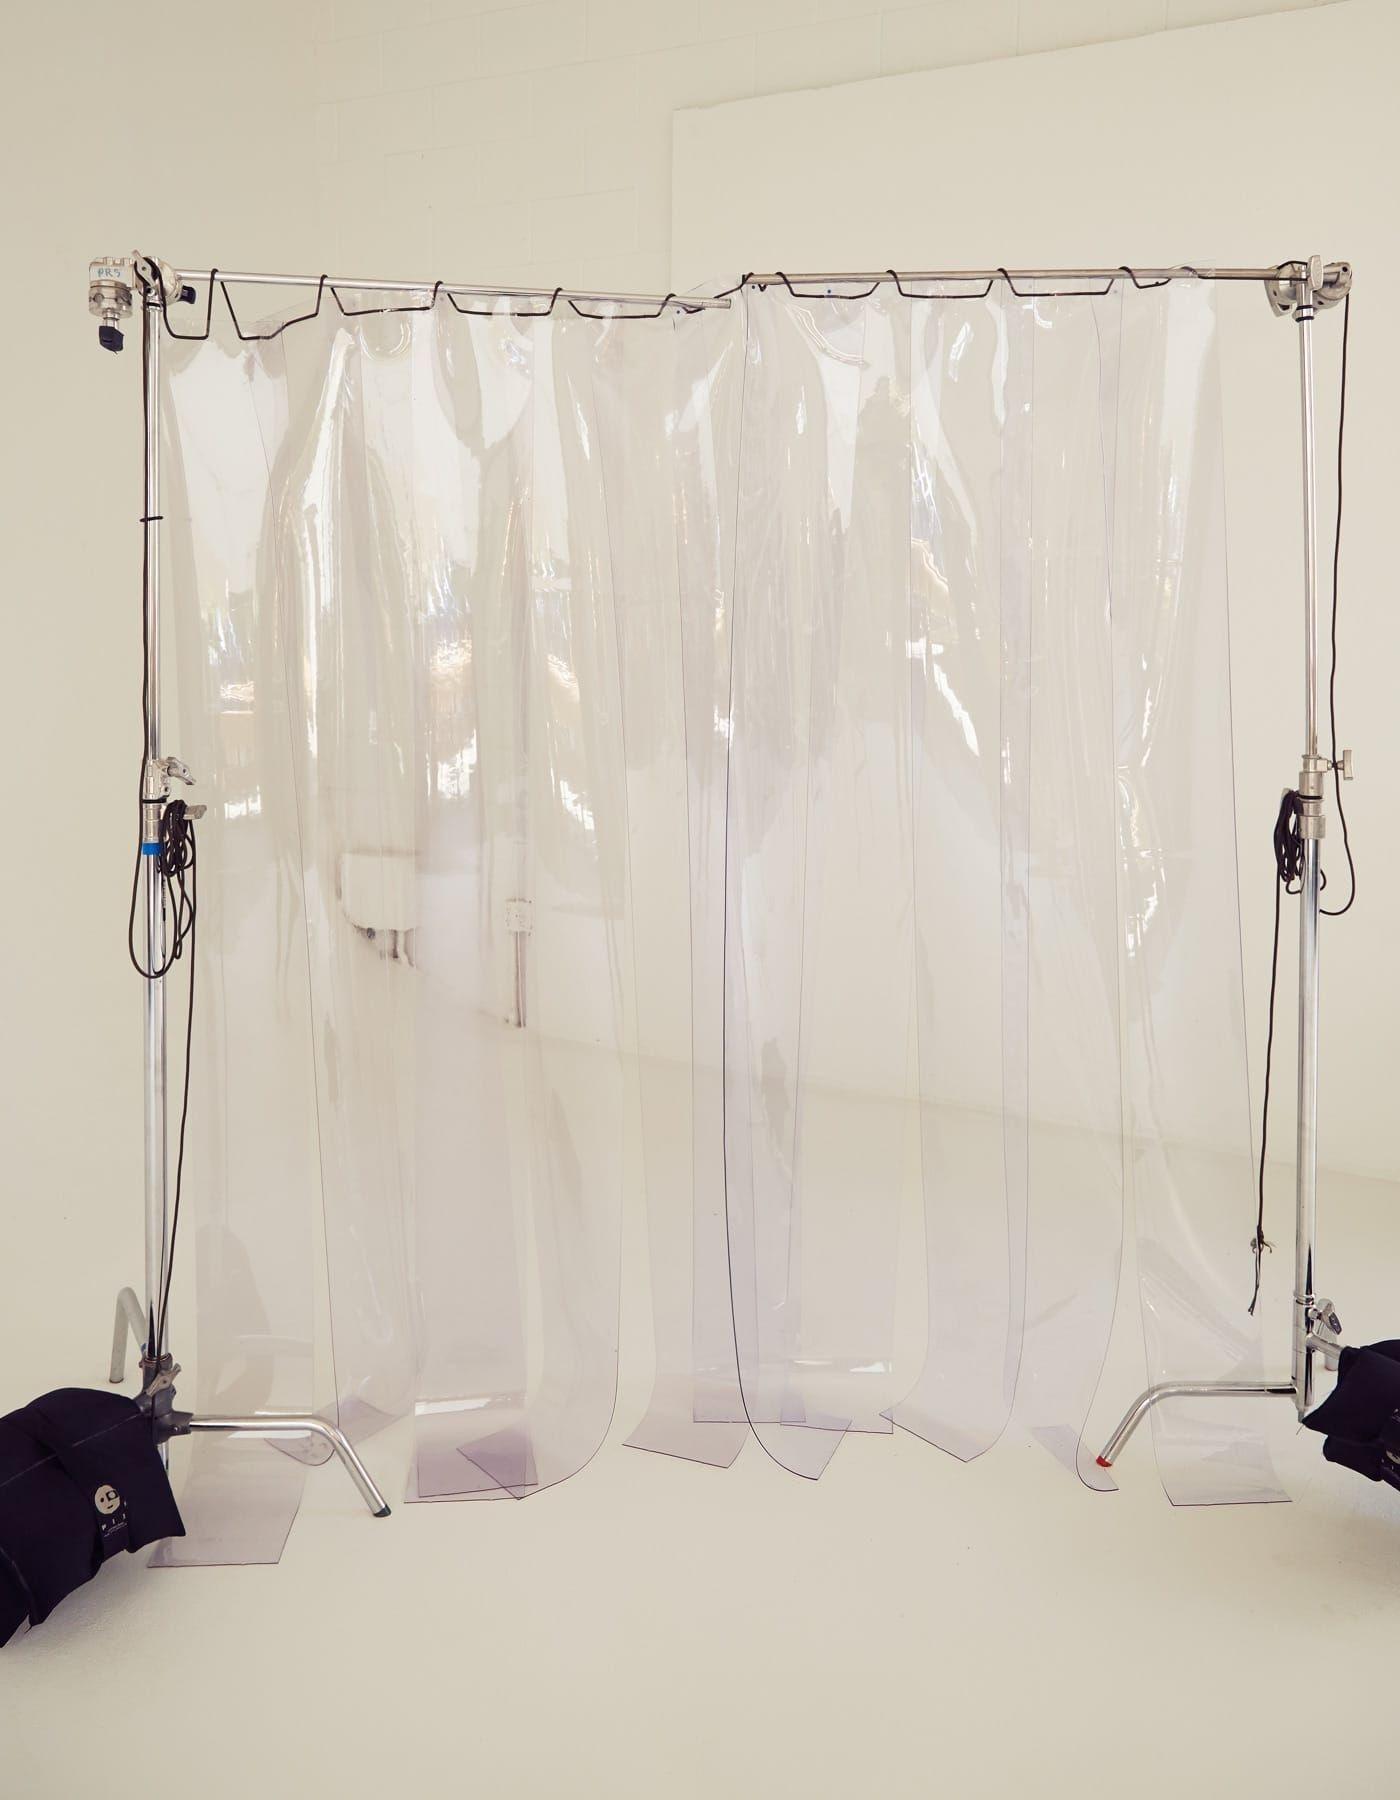 Plastic Curtain In 2020 Plastic Curtains Curtain Installation Stage Design